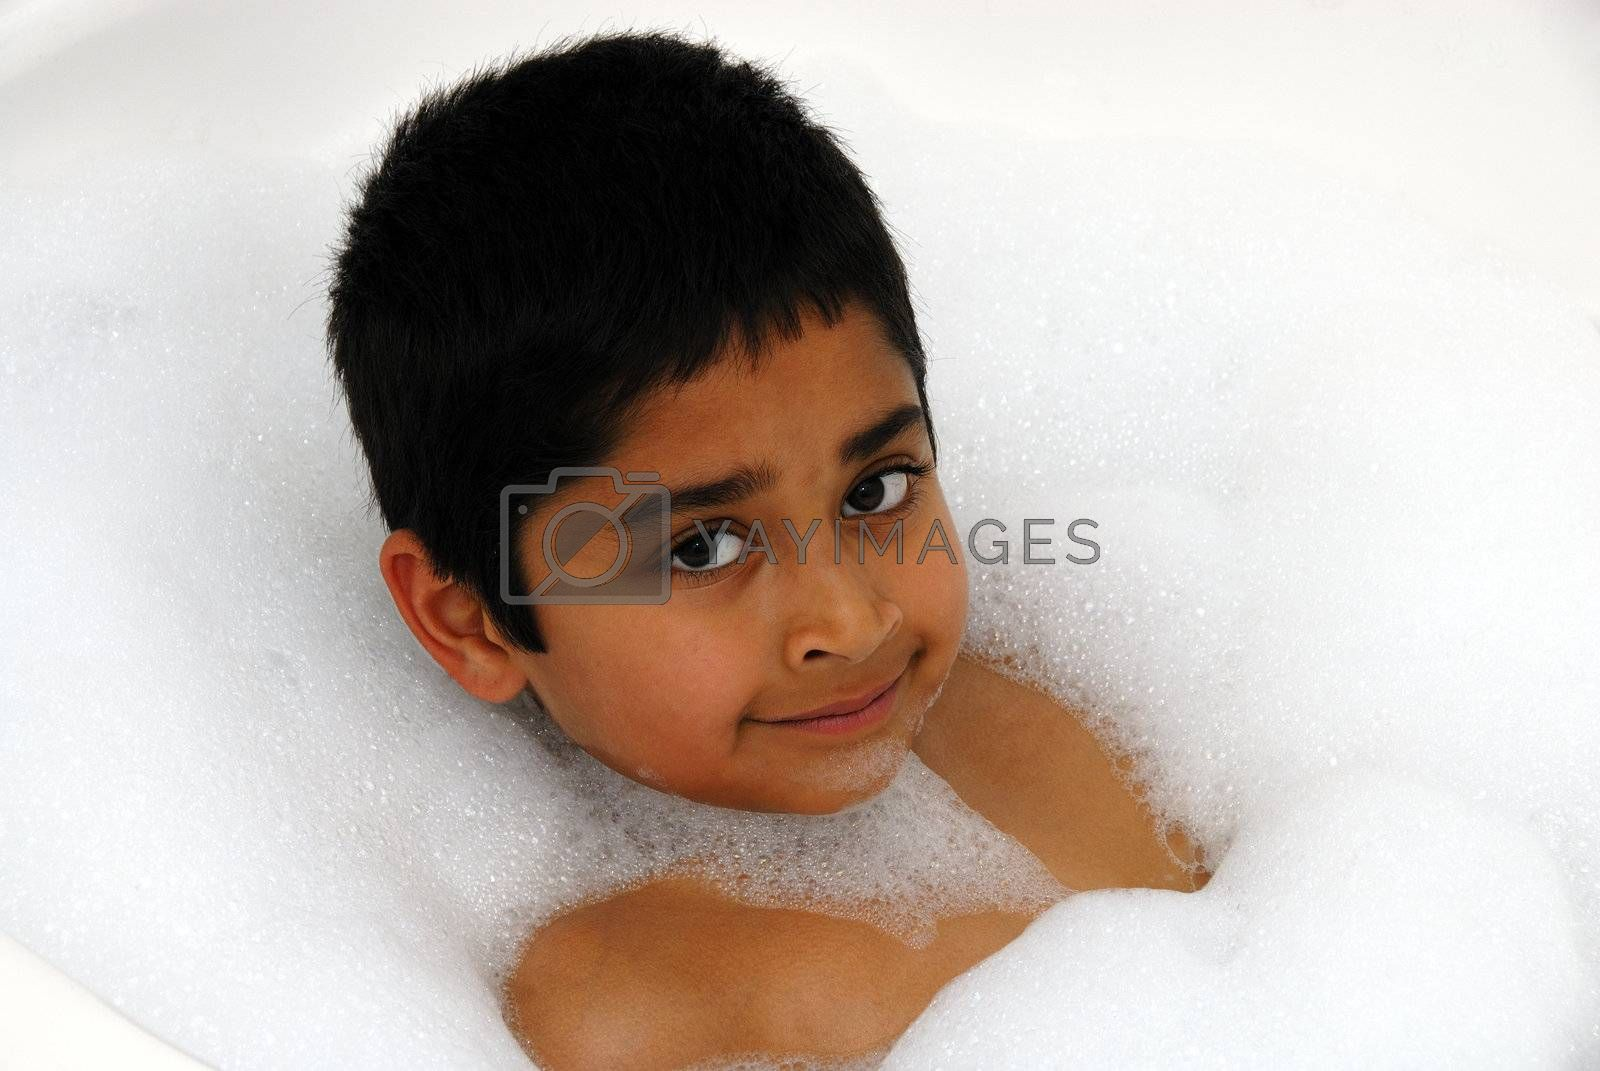 A happy kid enjoying his bubble batch